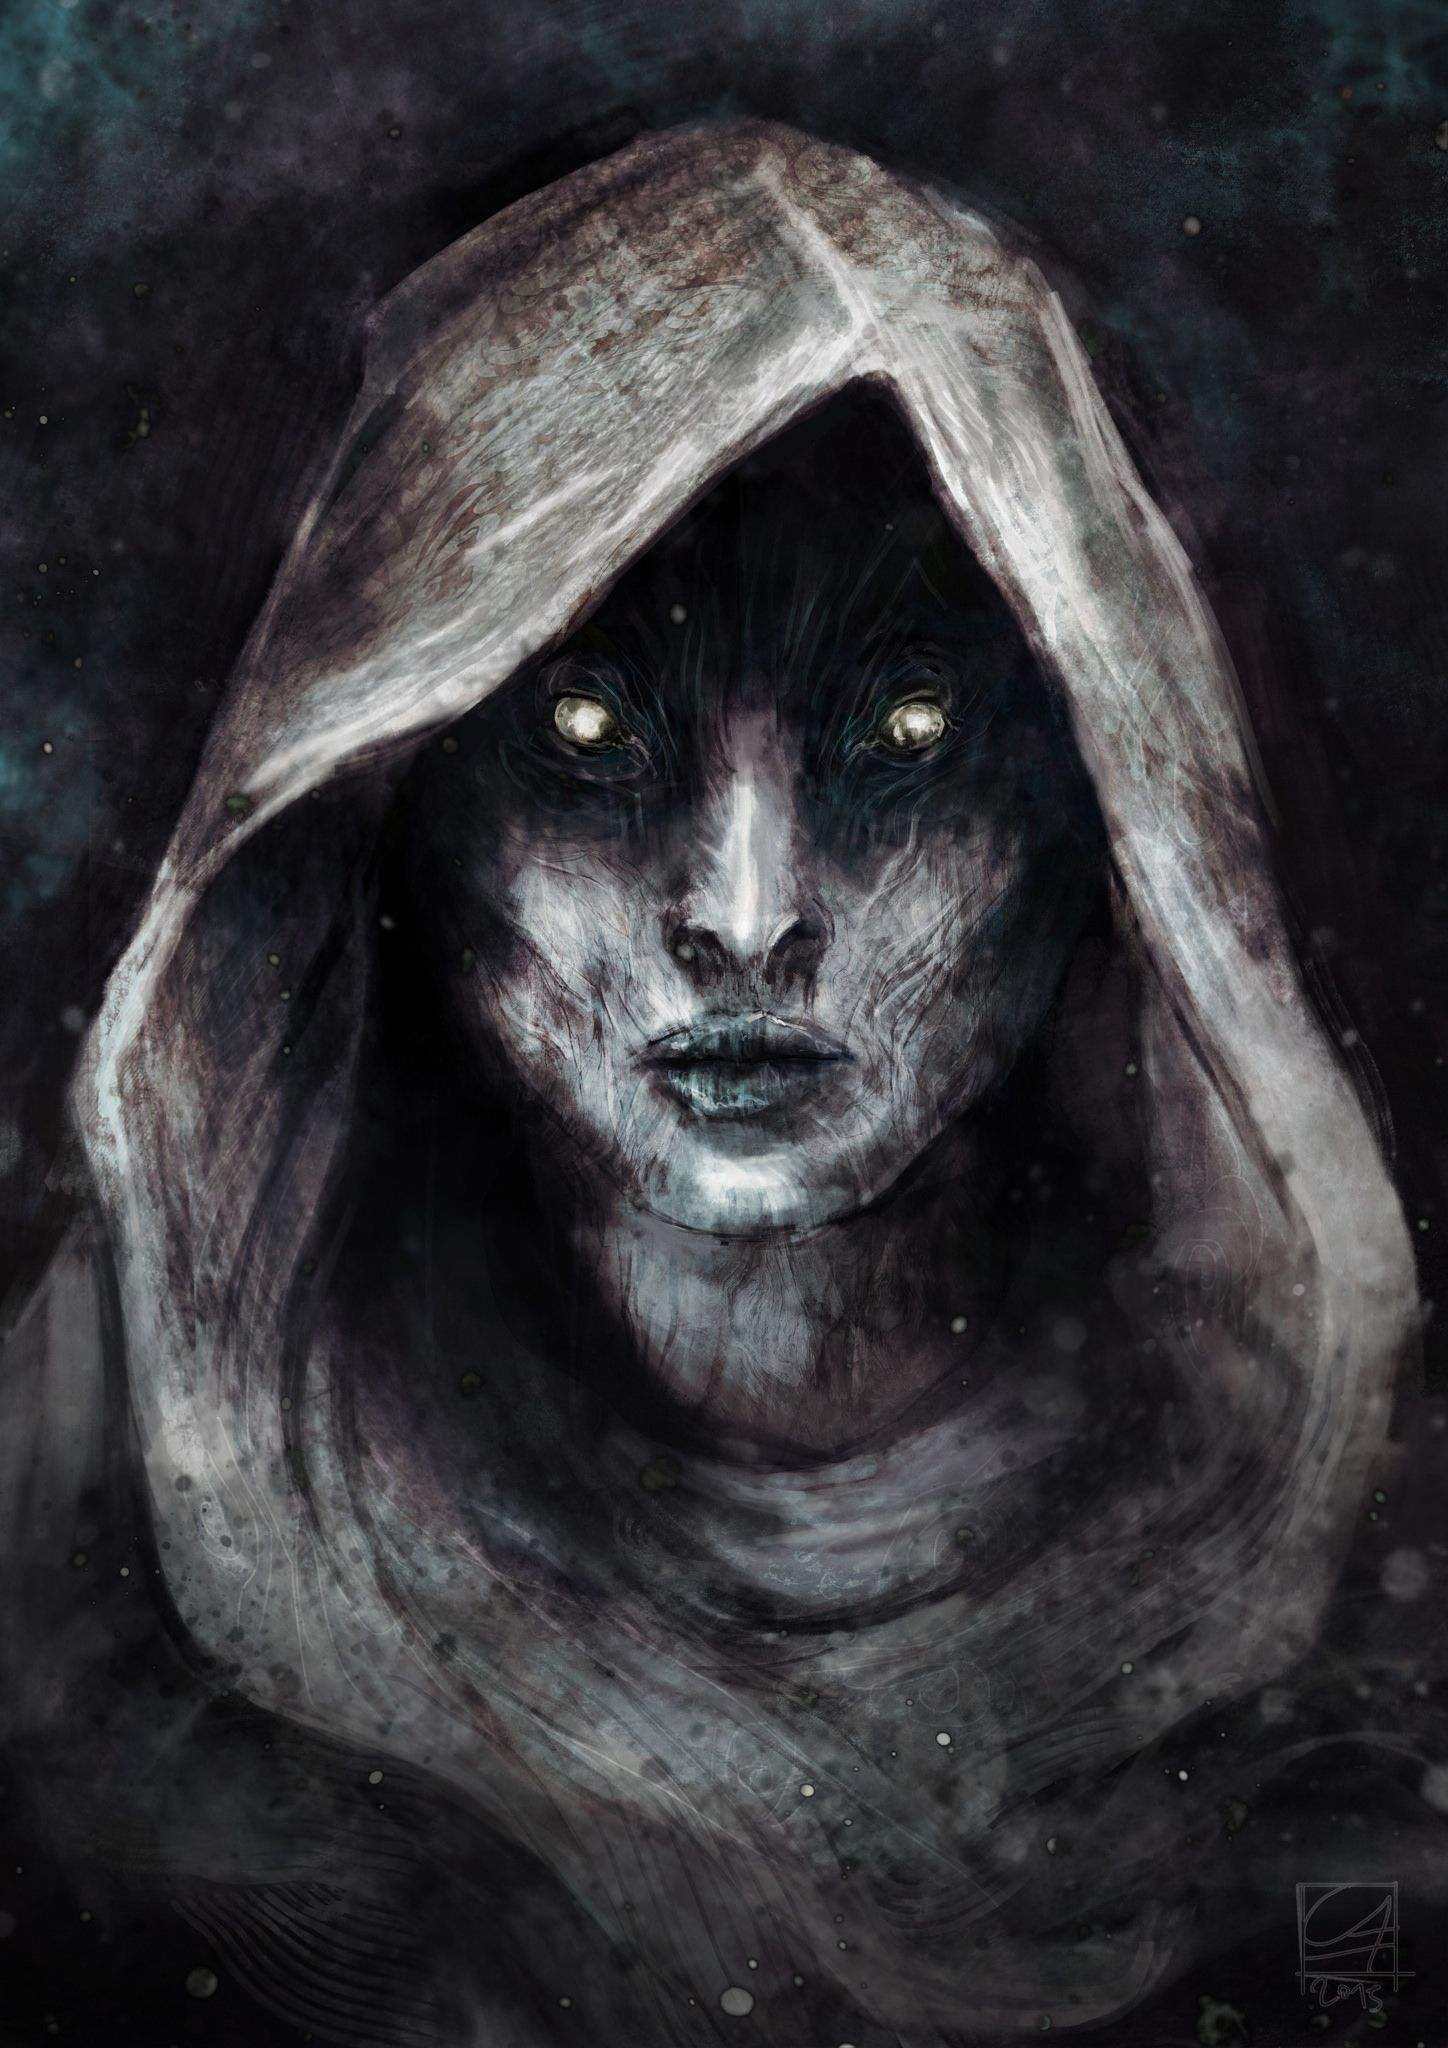 https://flic.kr/p/zrUP71 | Schattenhands Gesicht